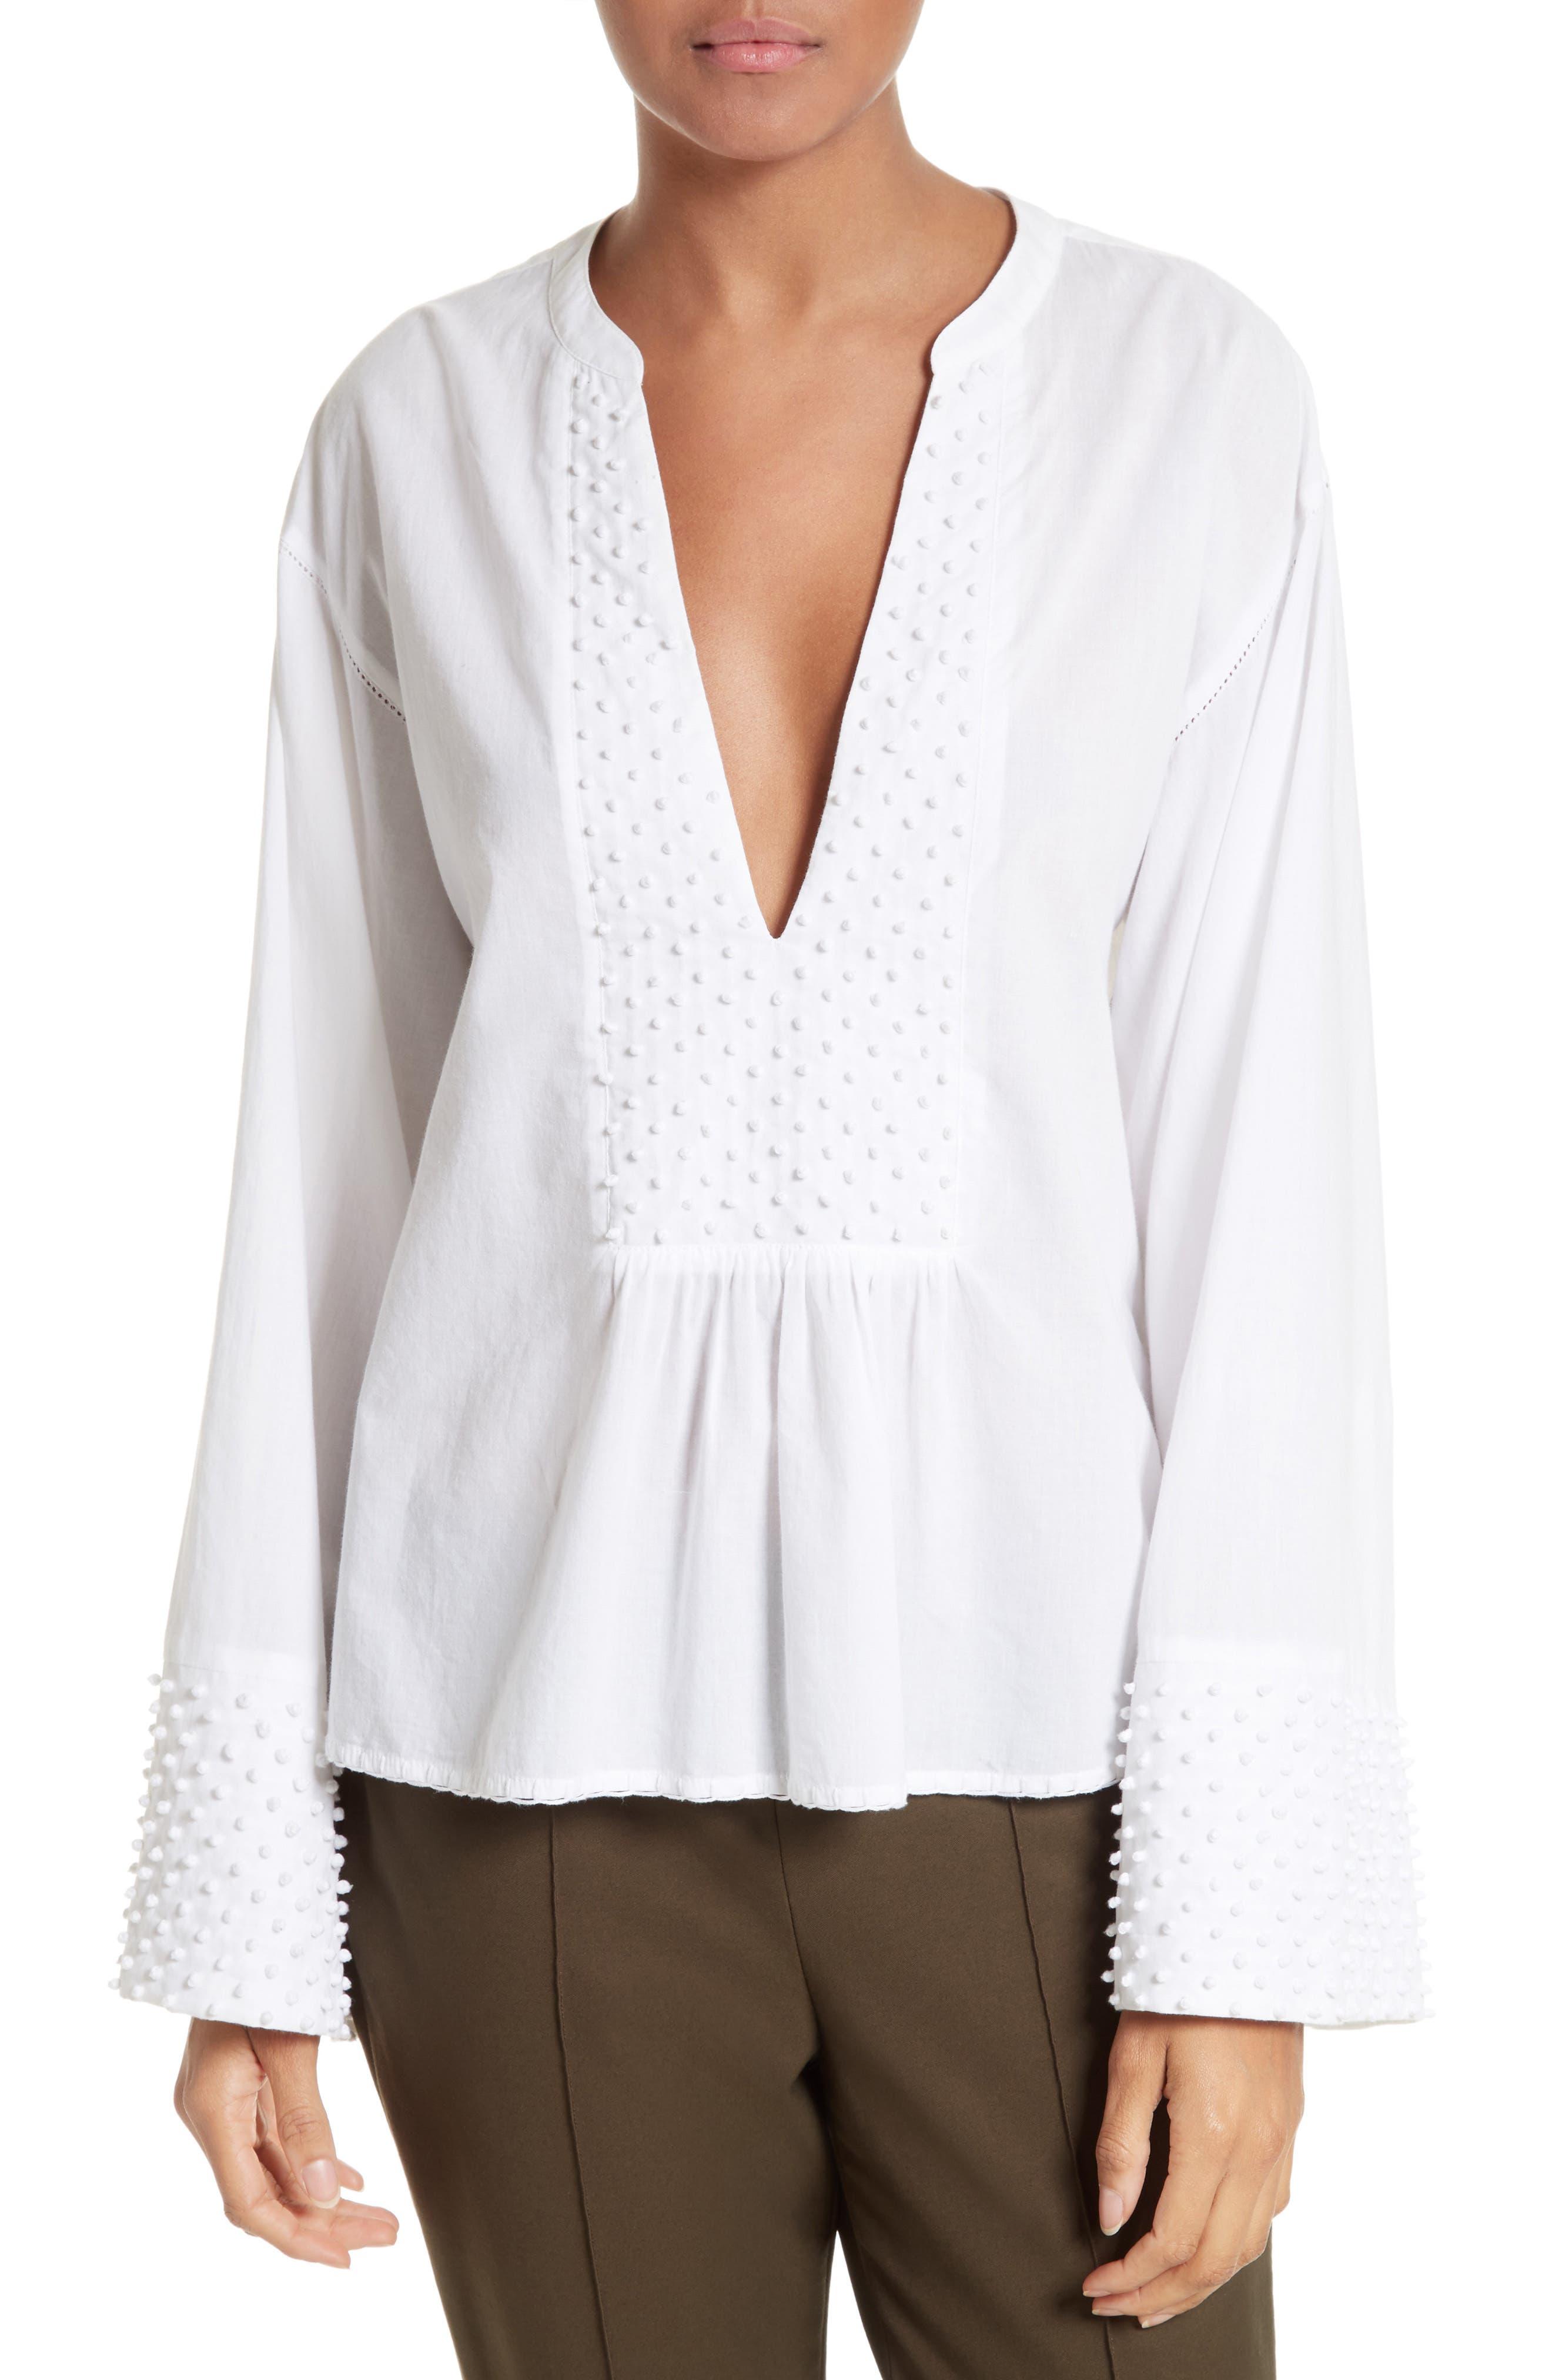 Alternate Image 1 Selected - Theory Matara E Embroidered Cotton Top